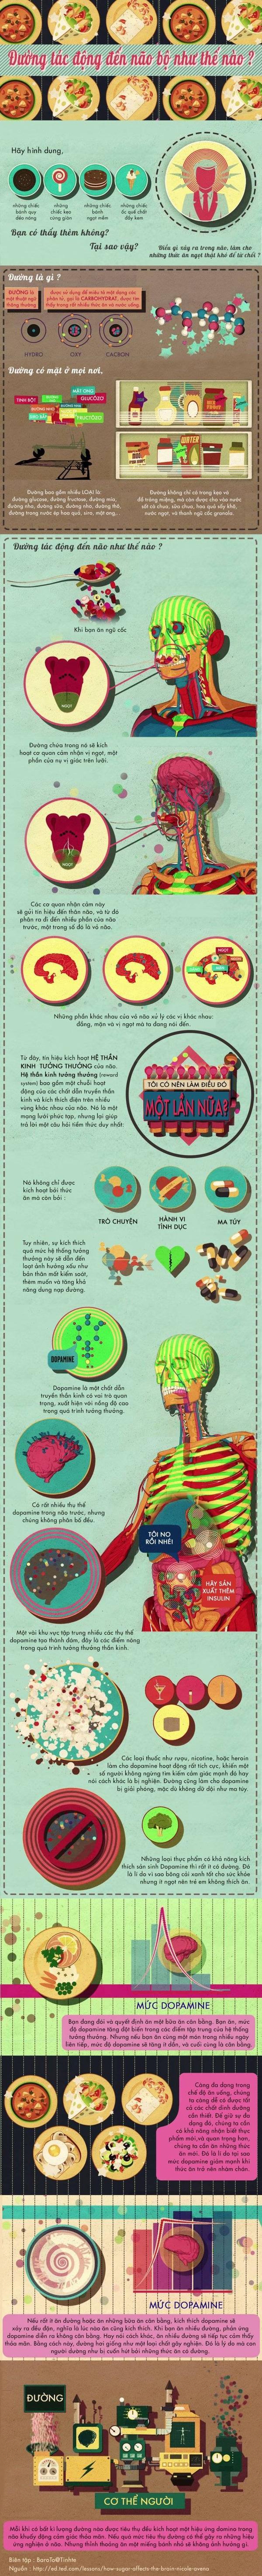 3143294_infographic_sugar